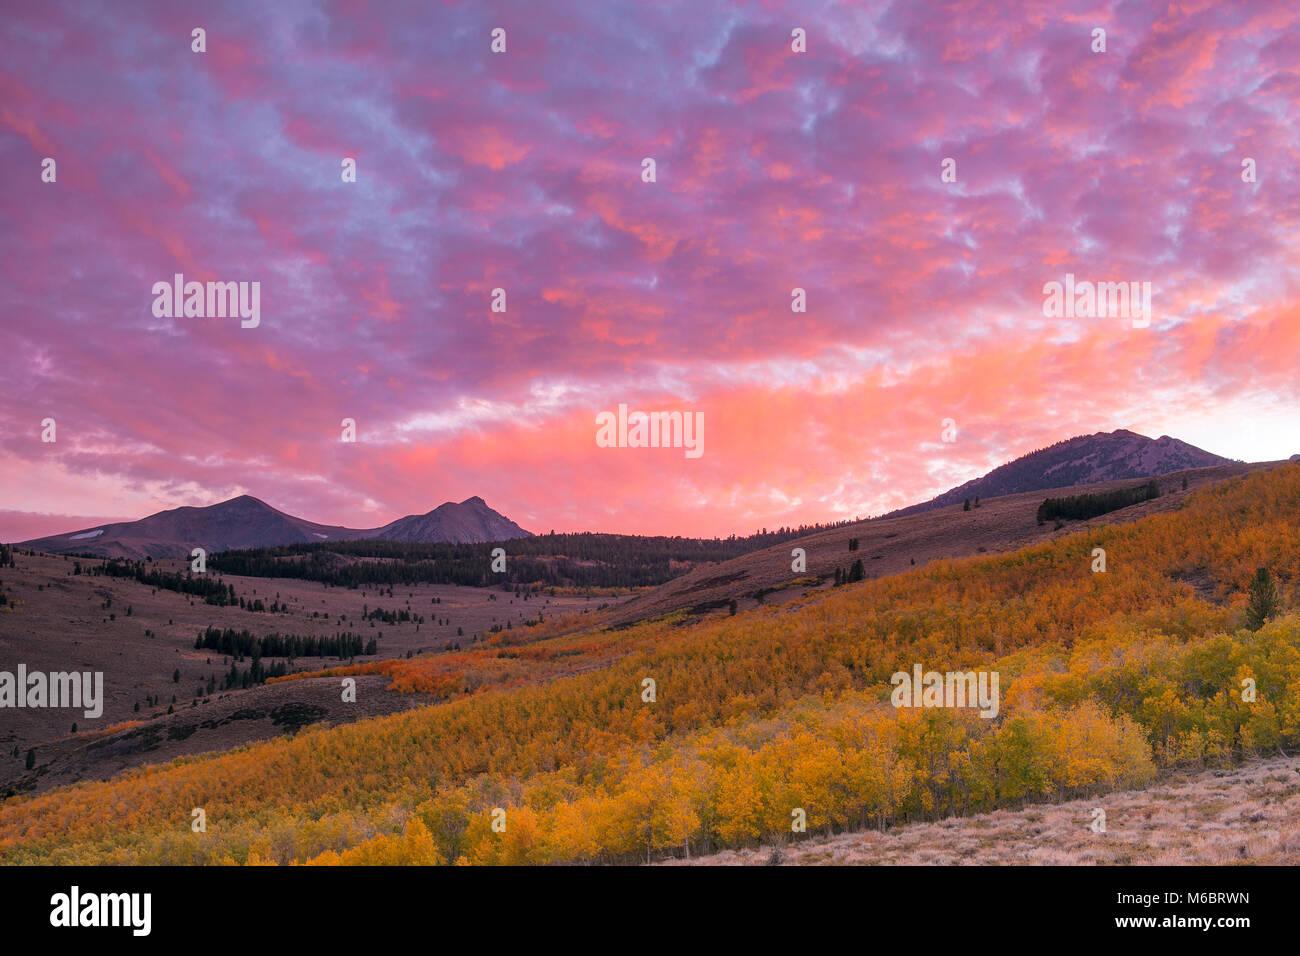 Sunset, Aspen, Conway Summit, Mt. Warren, Gilcrest Peak, Inyo National Forest, Eastern Sierra, California - Stock Image